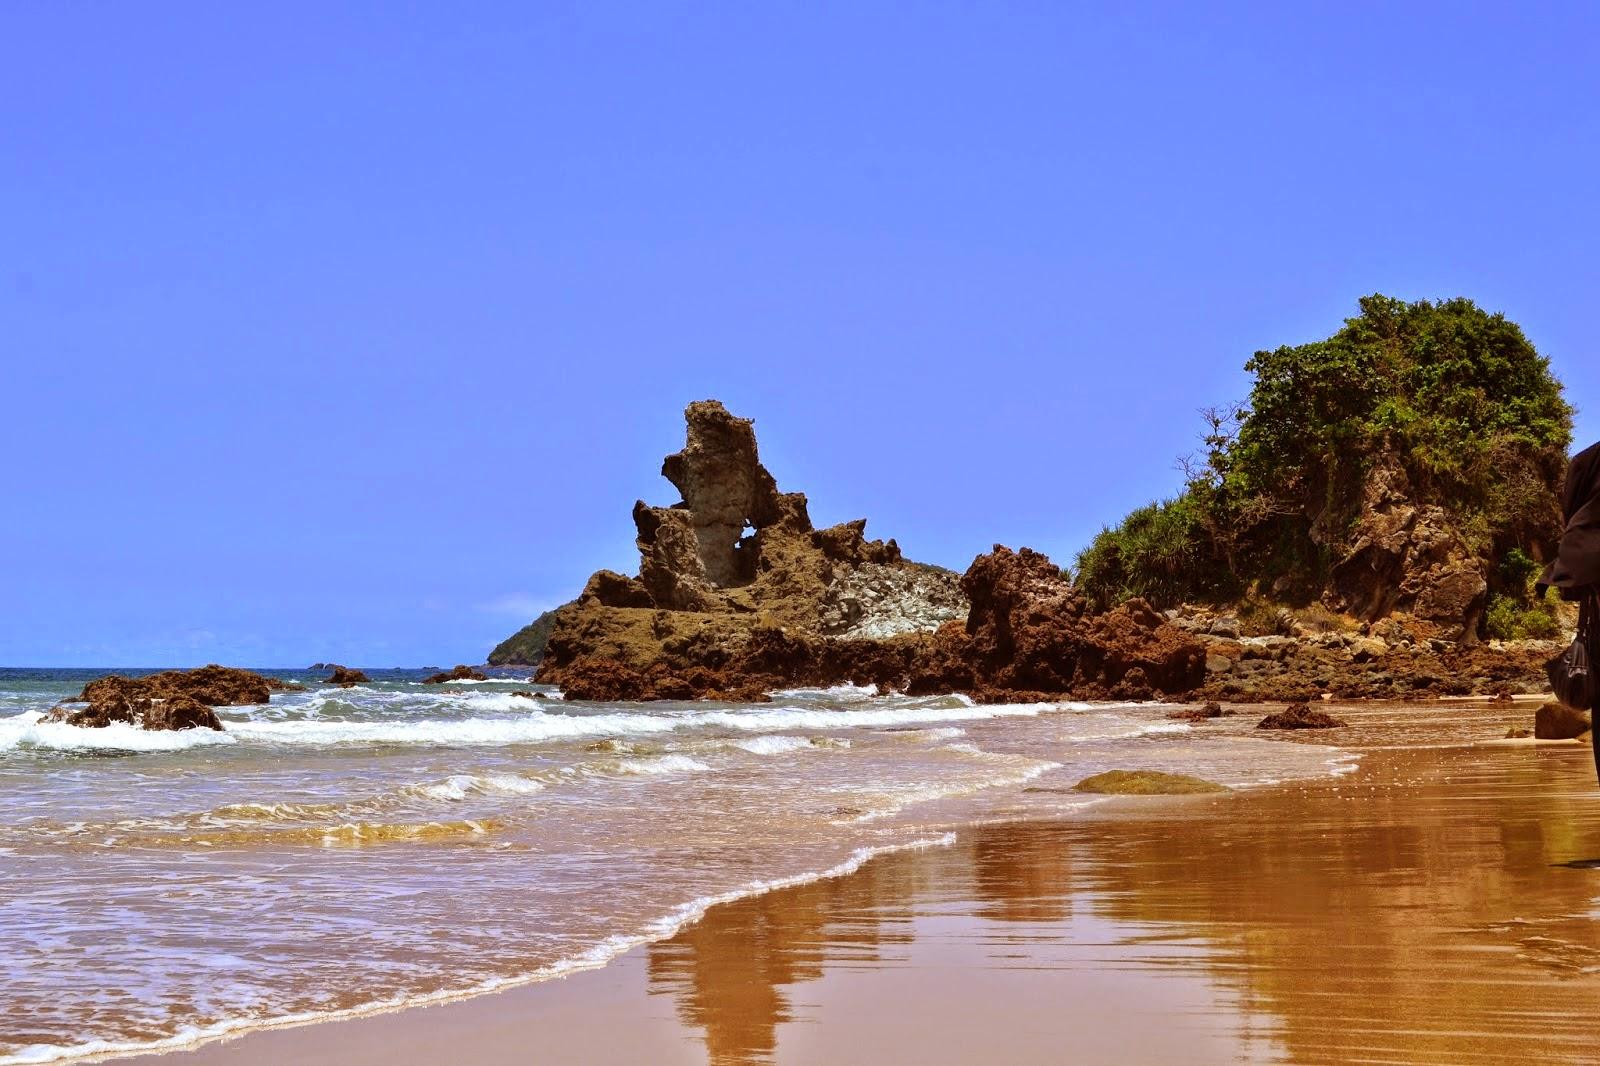 Jelajahi Pesona 6 Objek Wisata Pantai Banyuwangi Panduan Parang Kursi